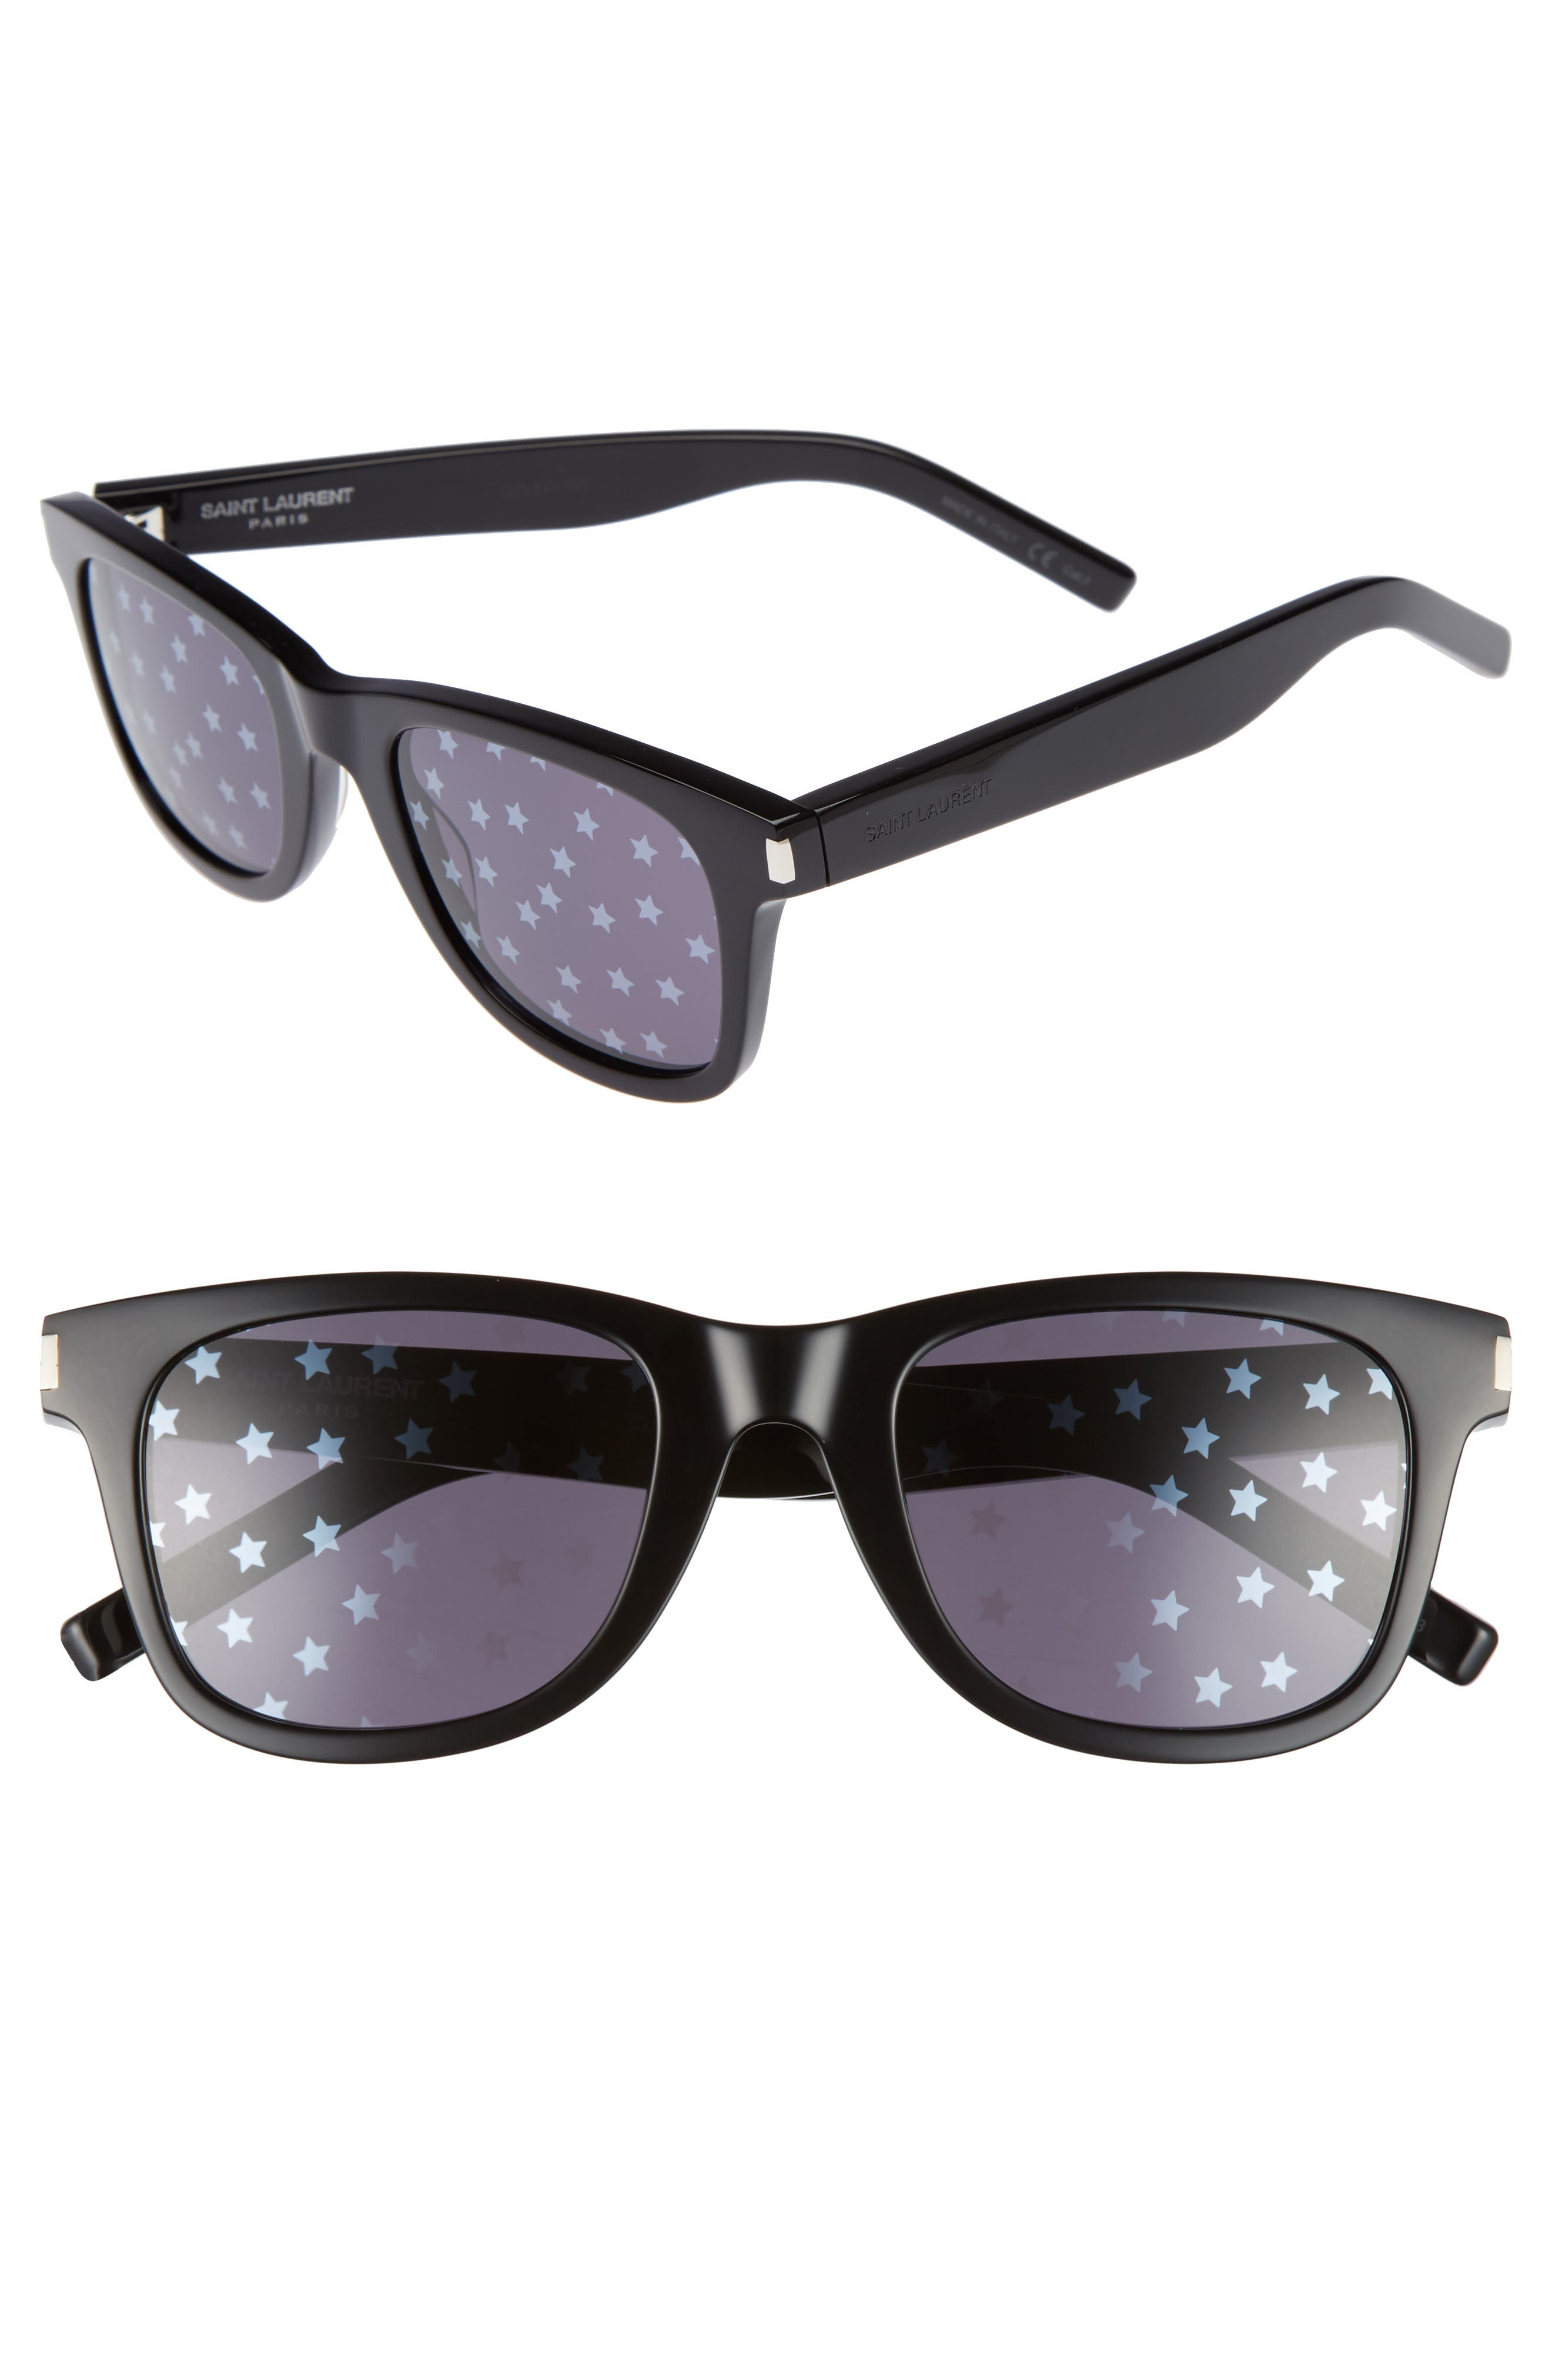 SL51 50mm Sunglasses,                         Main,                         color, Black/ Black